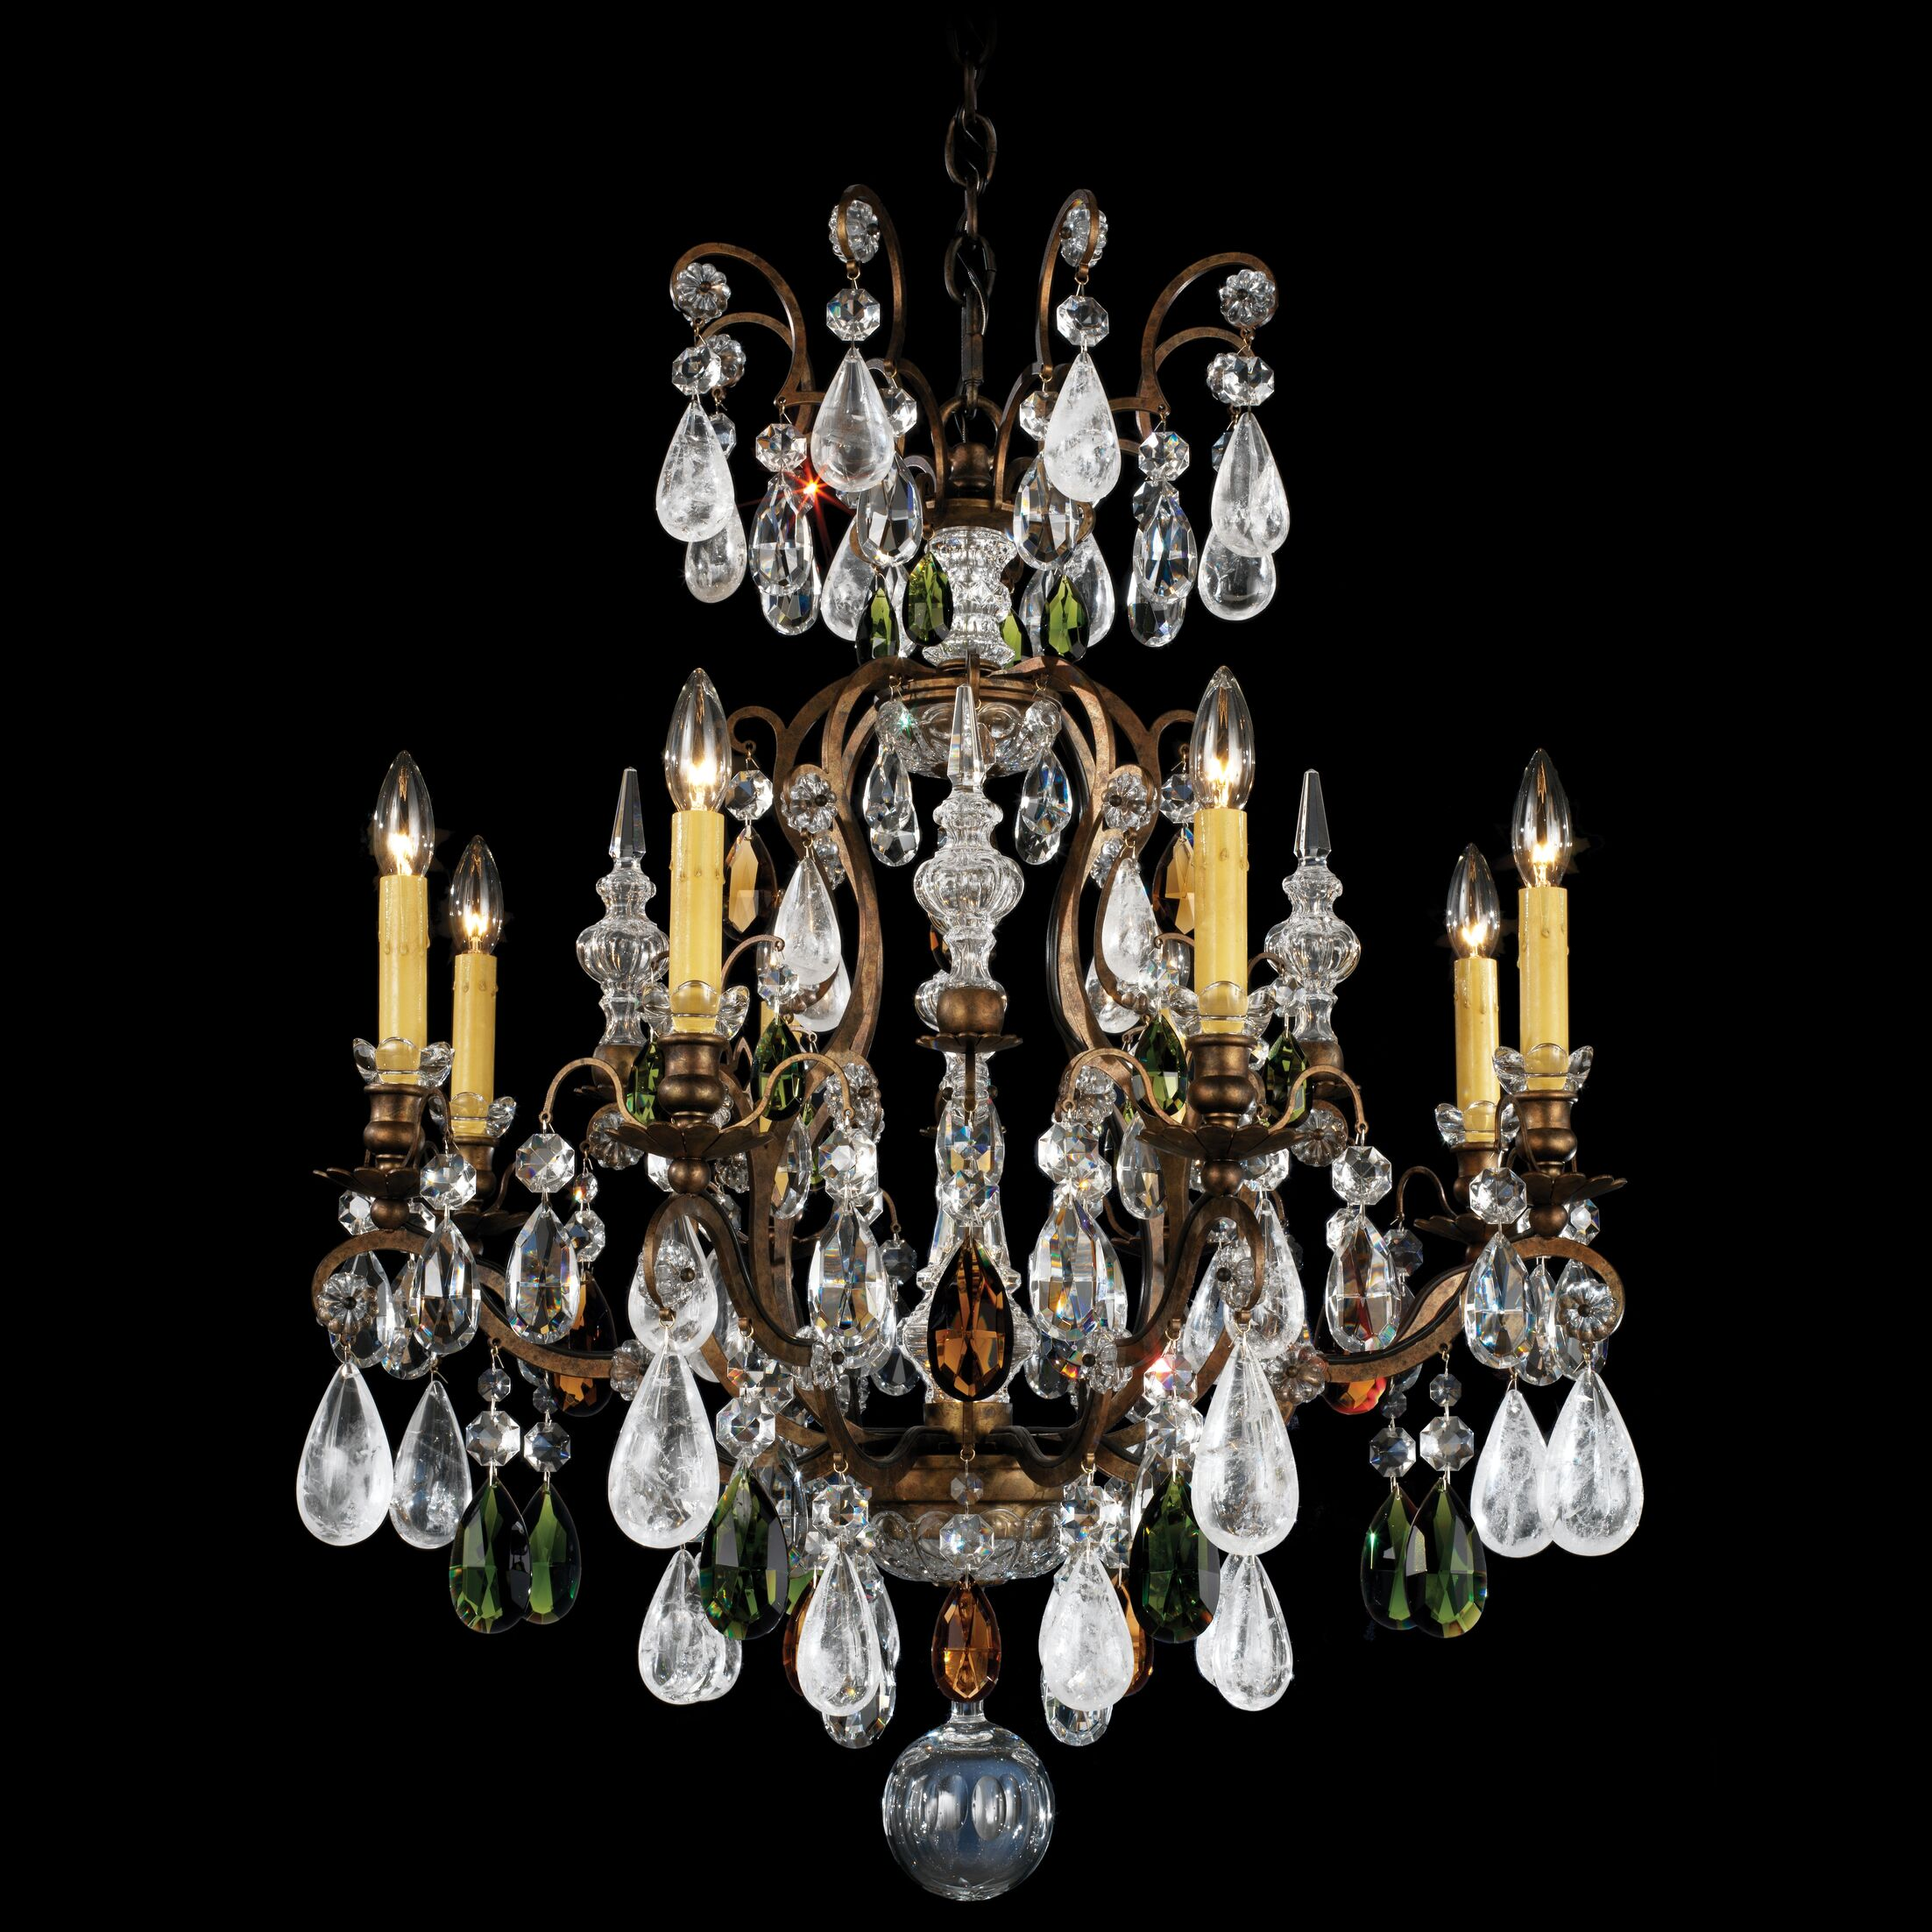 Renaissance Rock 8-Light Chandelier Finish: Heirloom Gold, Crystal Color: Clear Rock